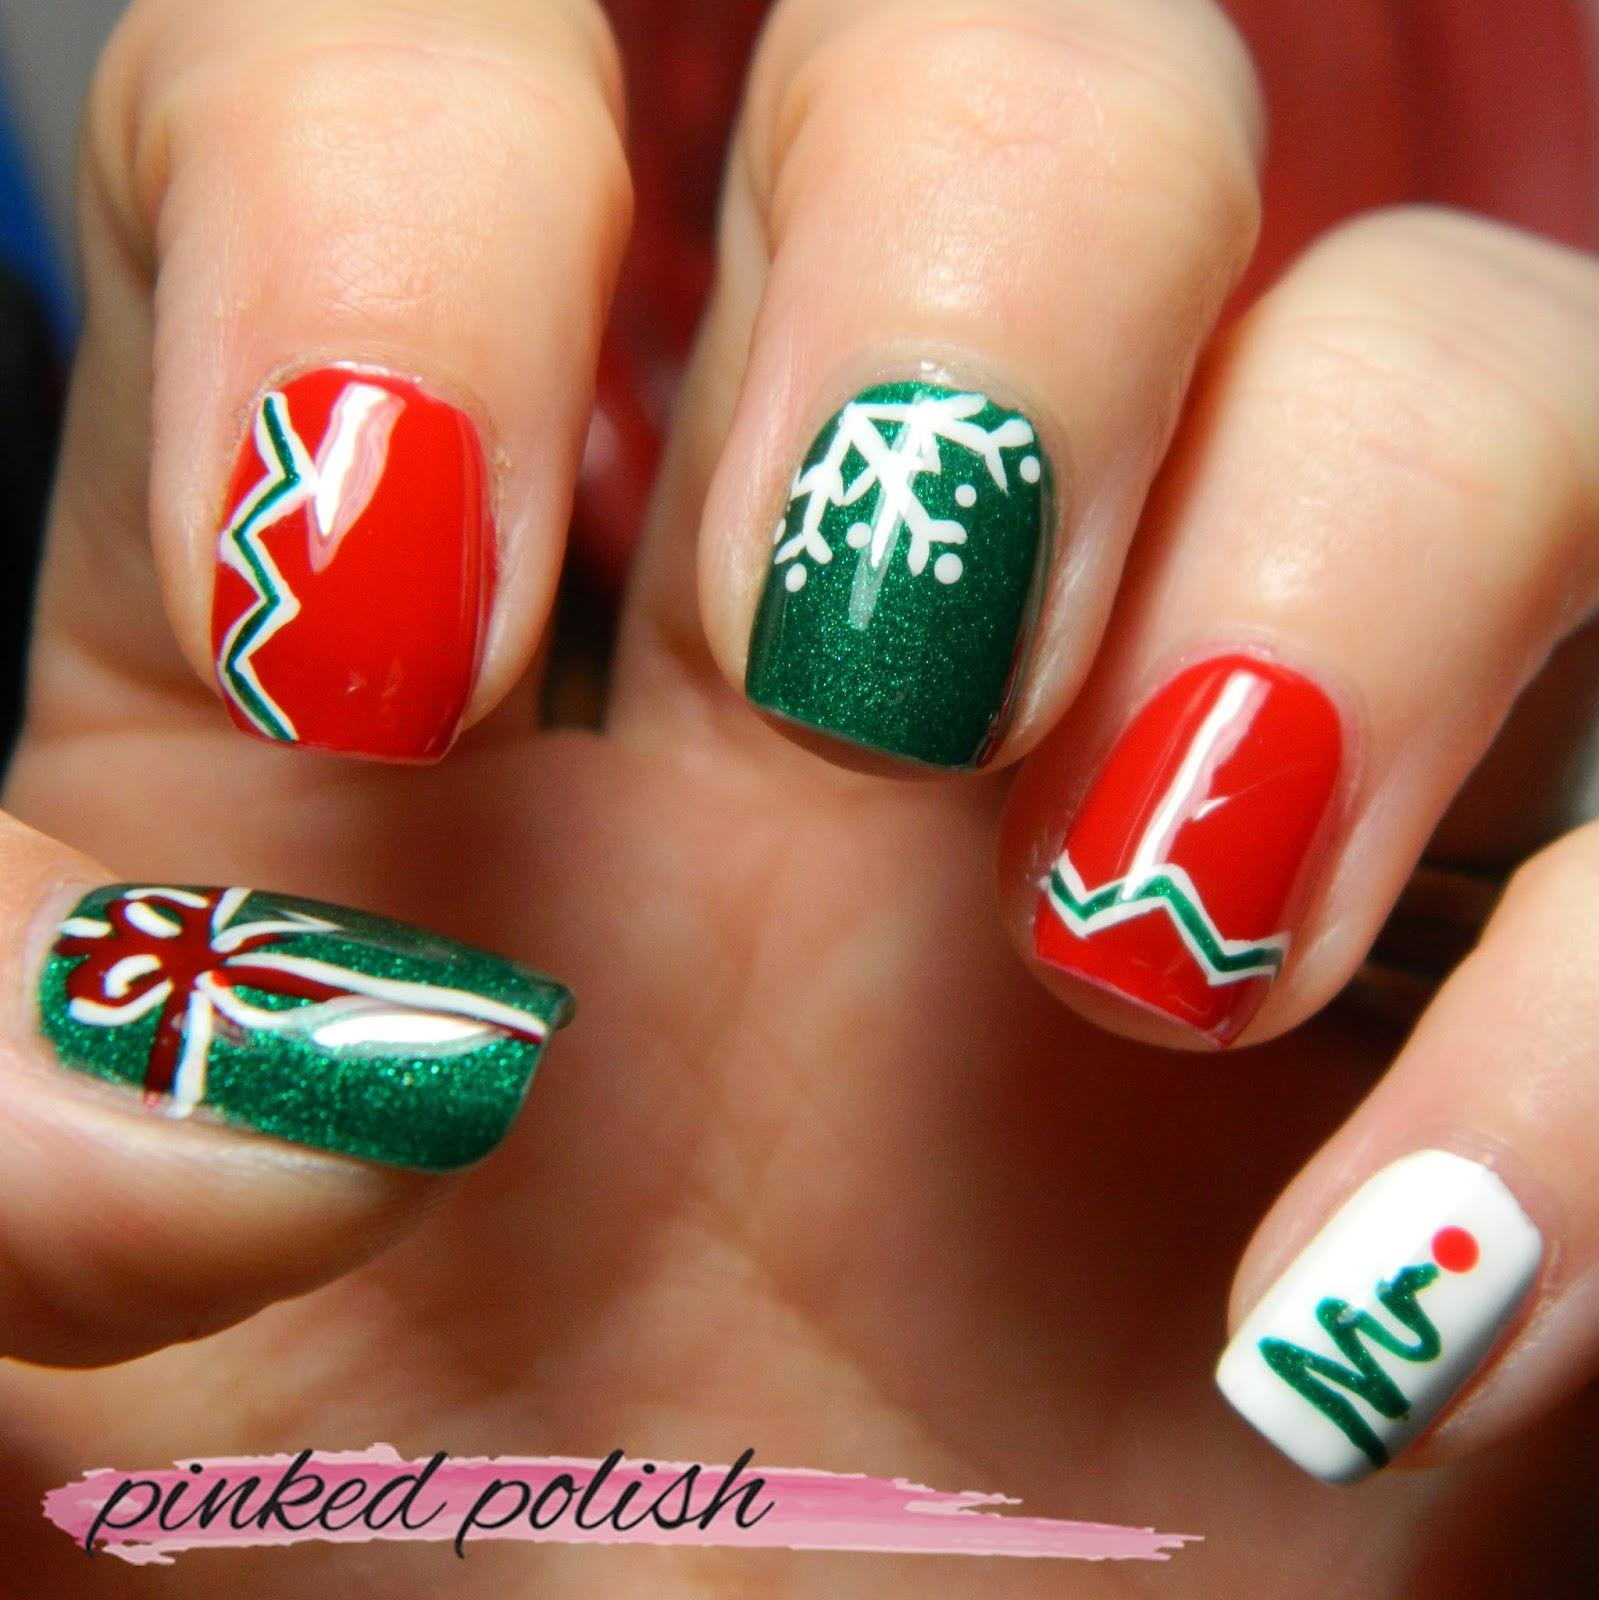 Nail Polish On Pinky Finger Meaning: Pinked Polish: Christmas Nails